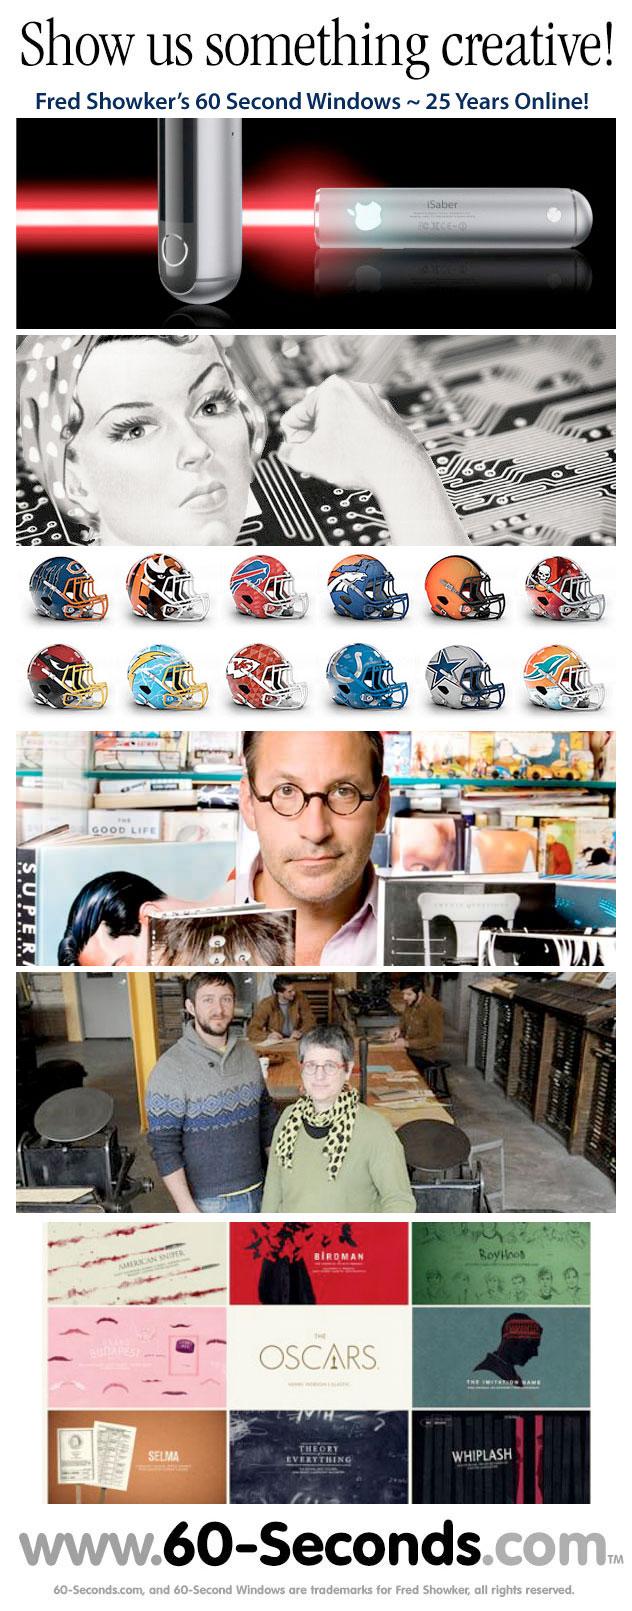 Fred Showker's Creative Tidbits